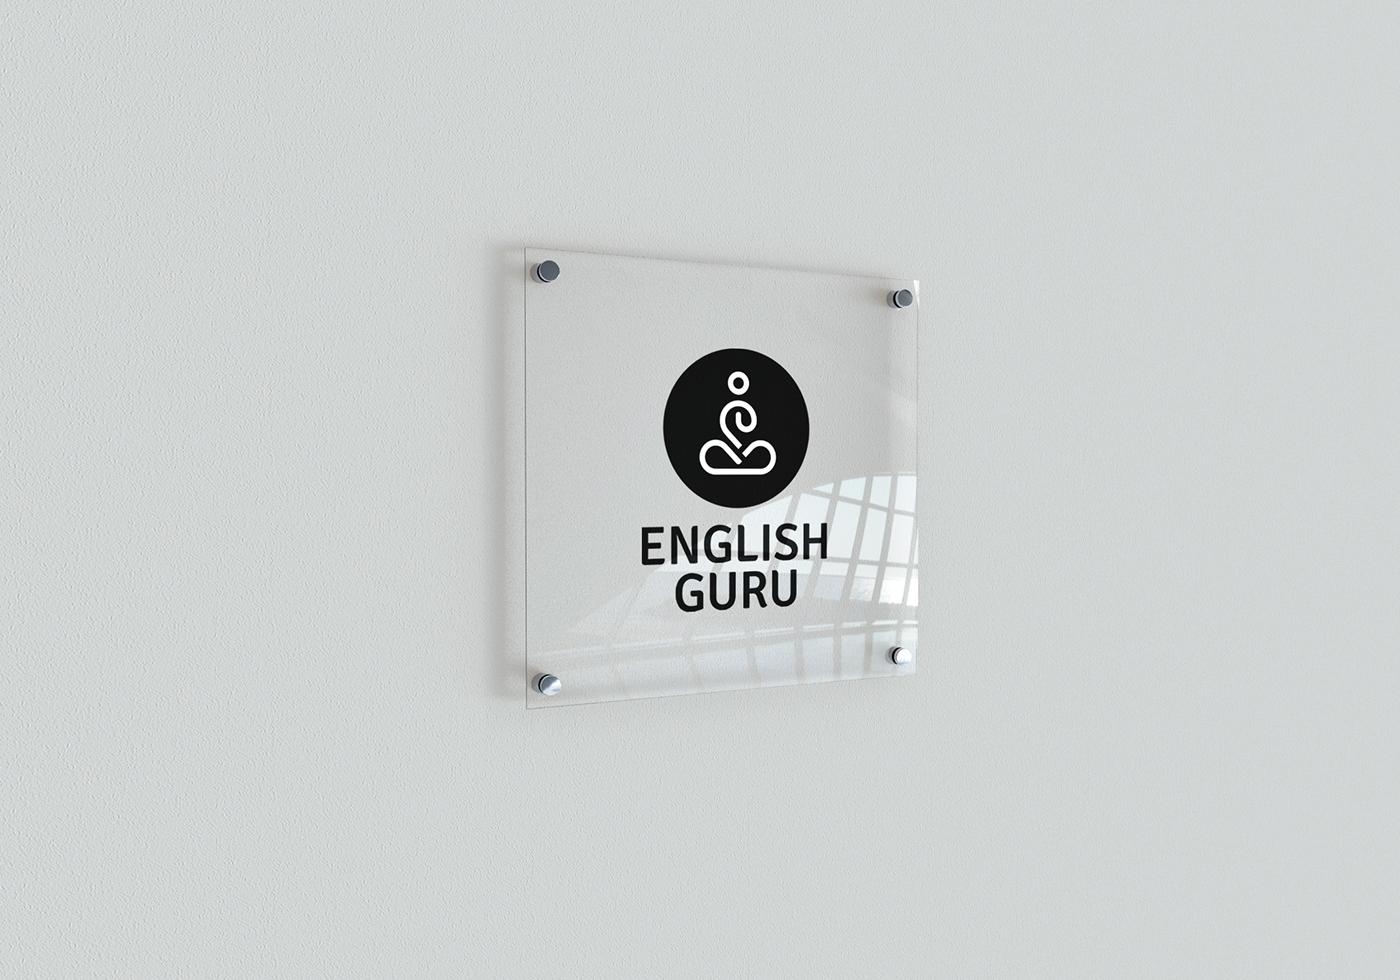 English guru yoga